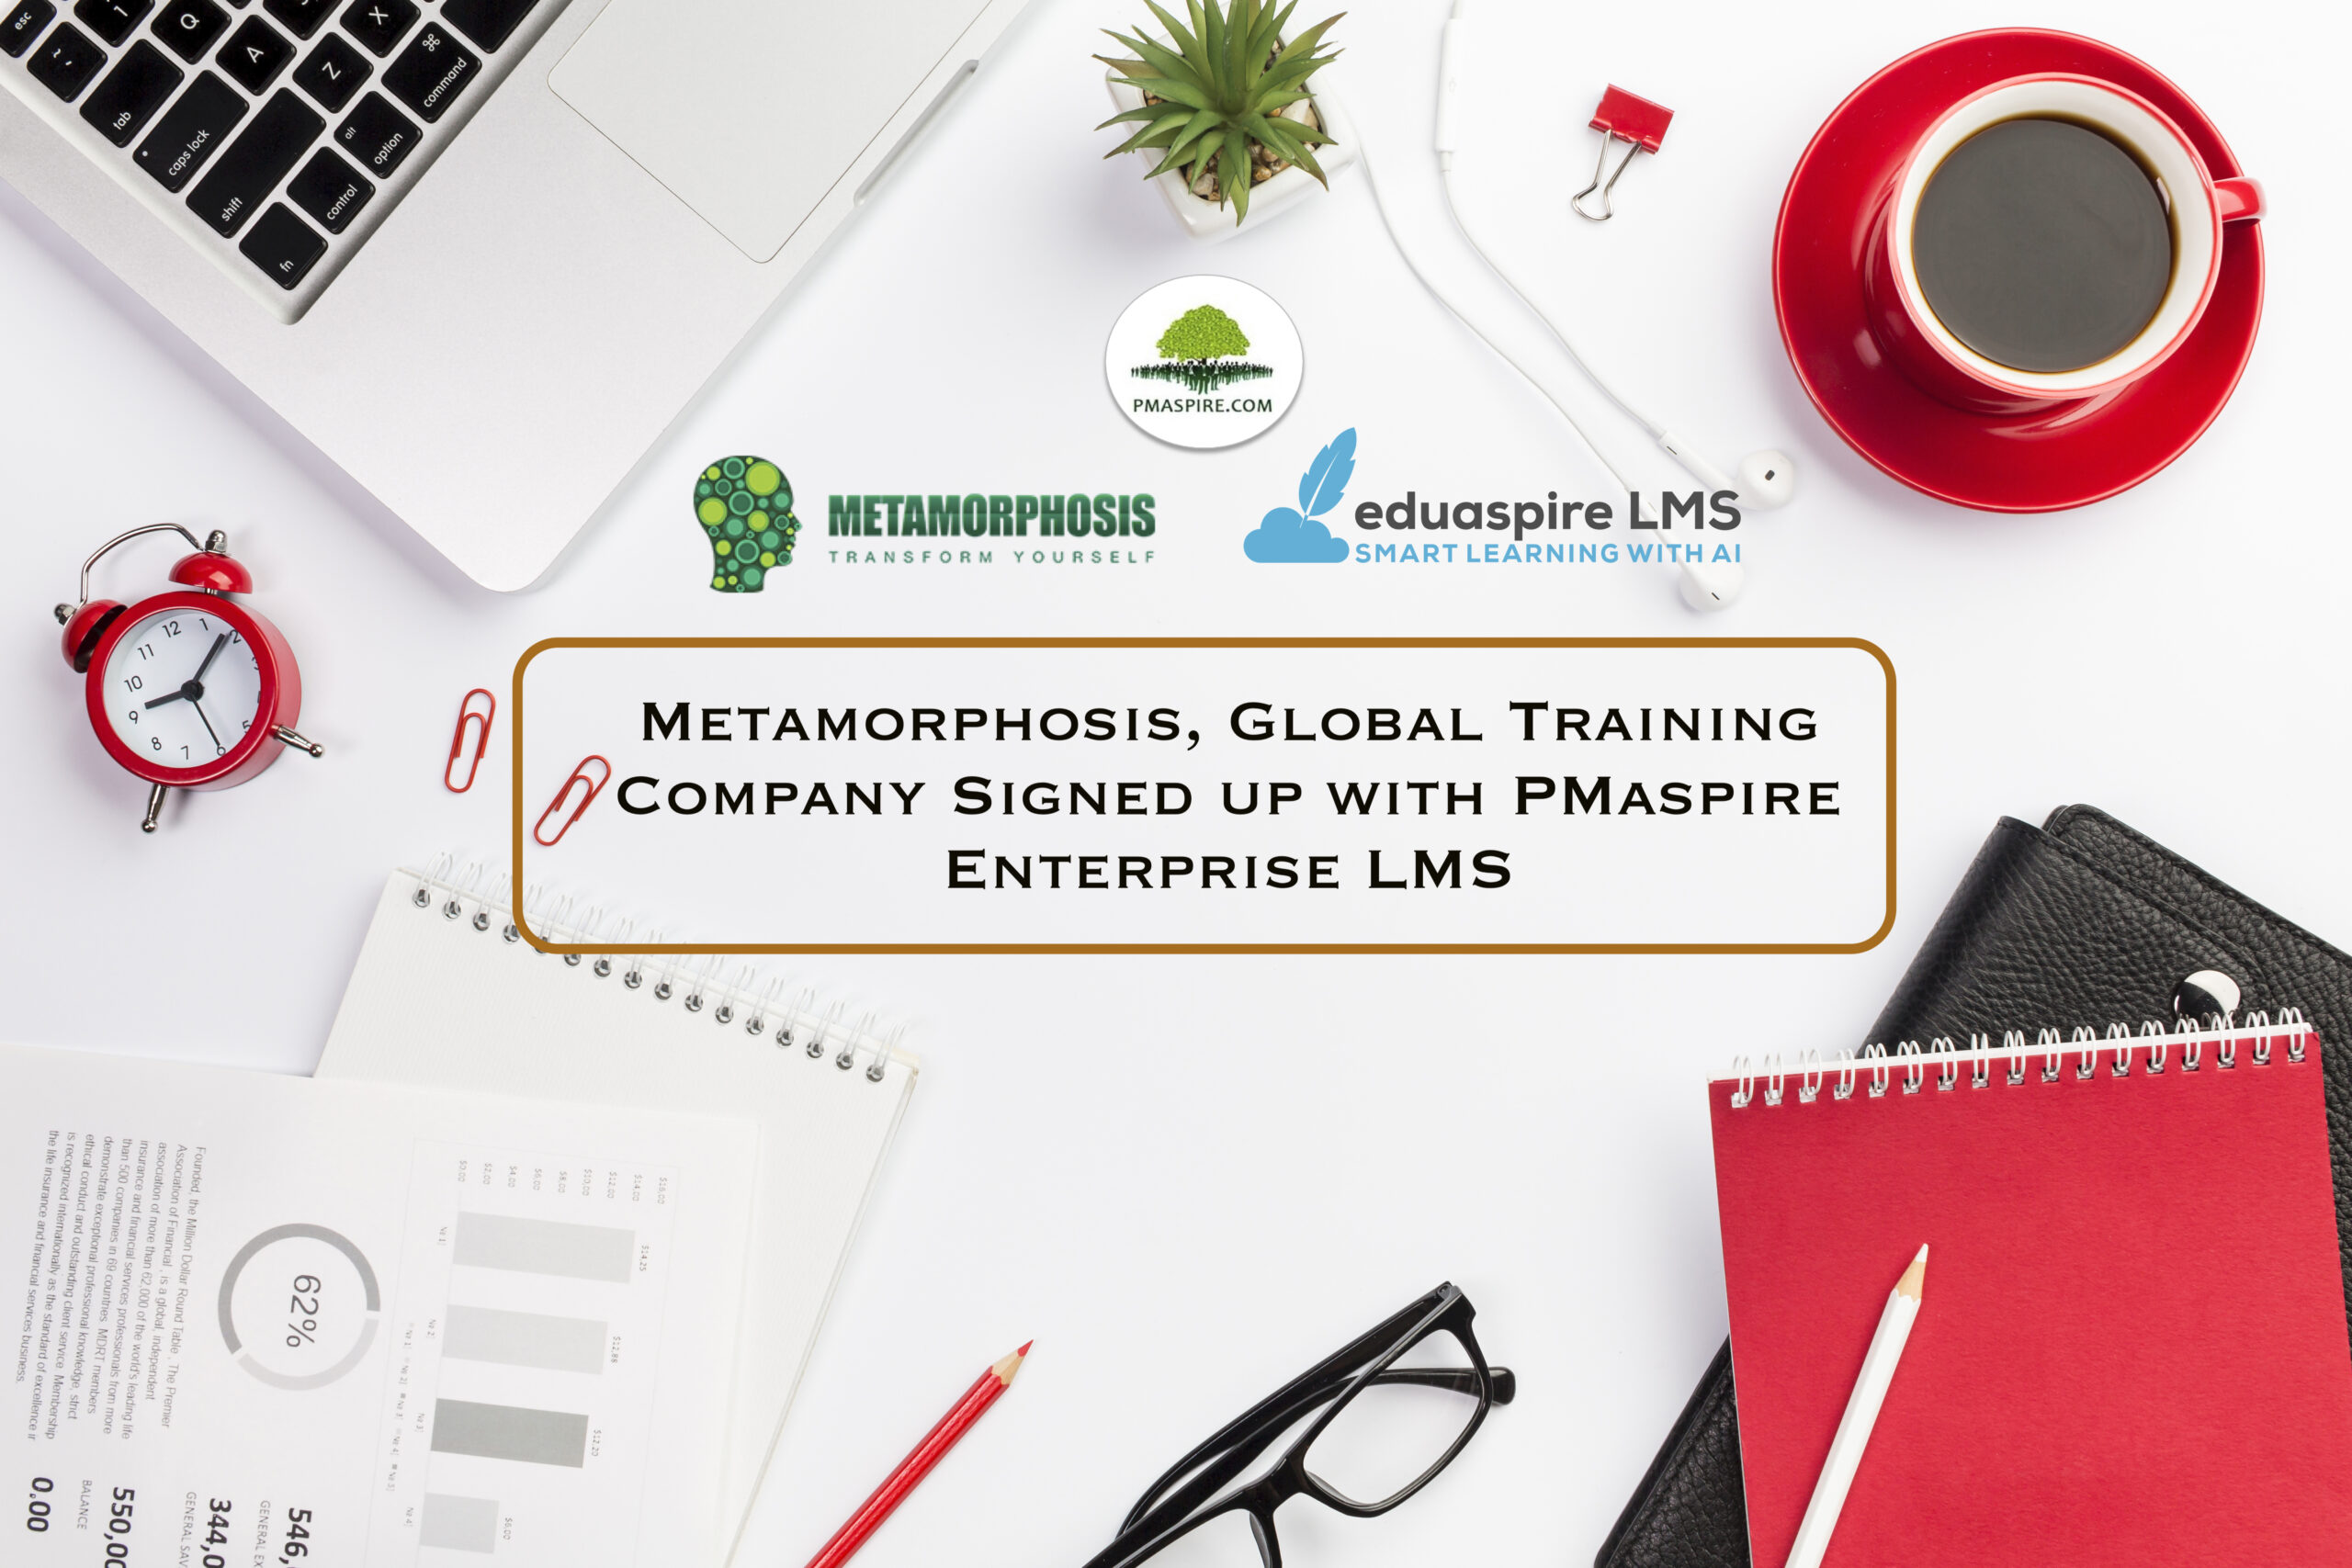 PMaspire Enterprise LMS